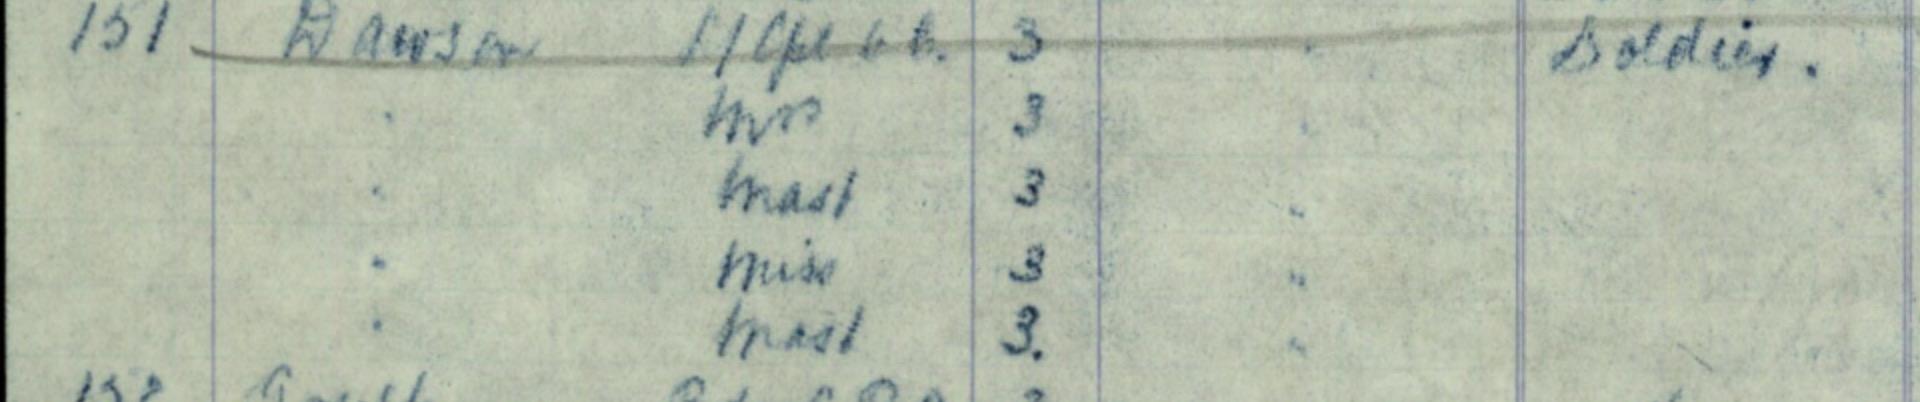 TravelGenee #atozchallenge C : Charles Collis Dawson Passenger List 1920